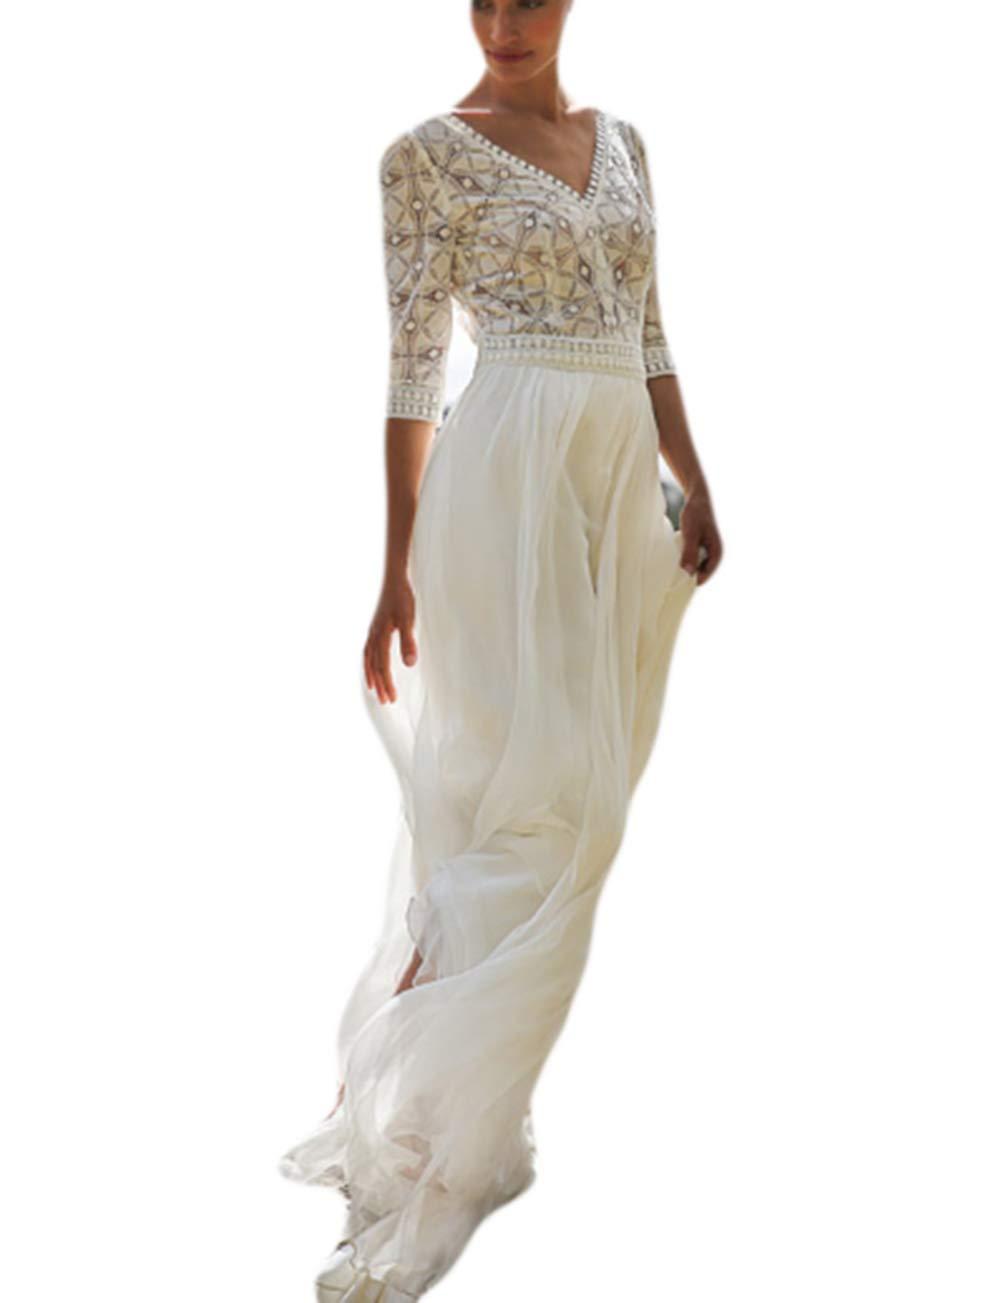 Bsubseach White Chiffon Half Sleeve Long Cover Up Dress Women V Neck Hollow Out Swimsuit Swimwear Wedding Dresses Beach Robe